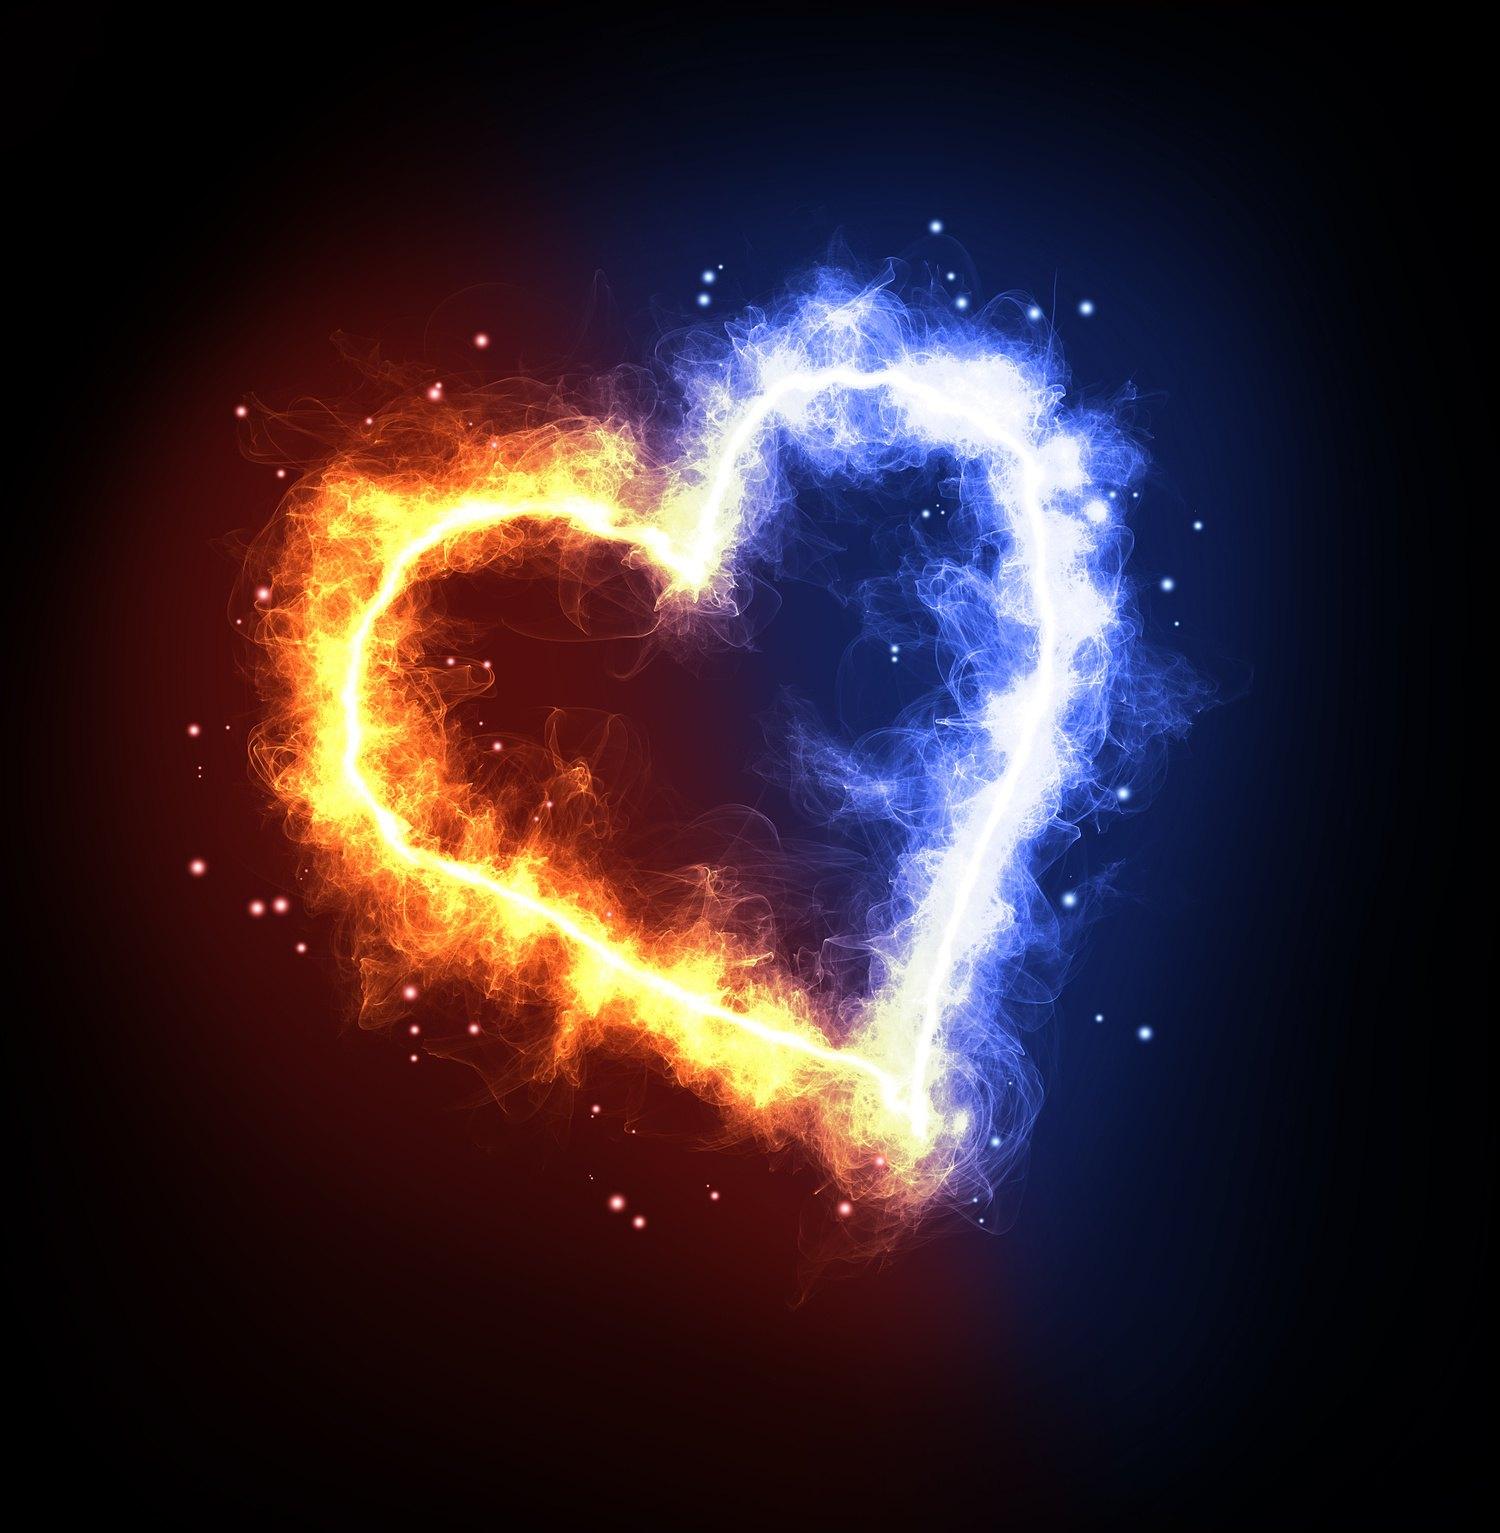 Photo of heart shape